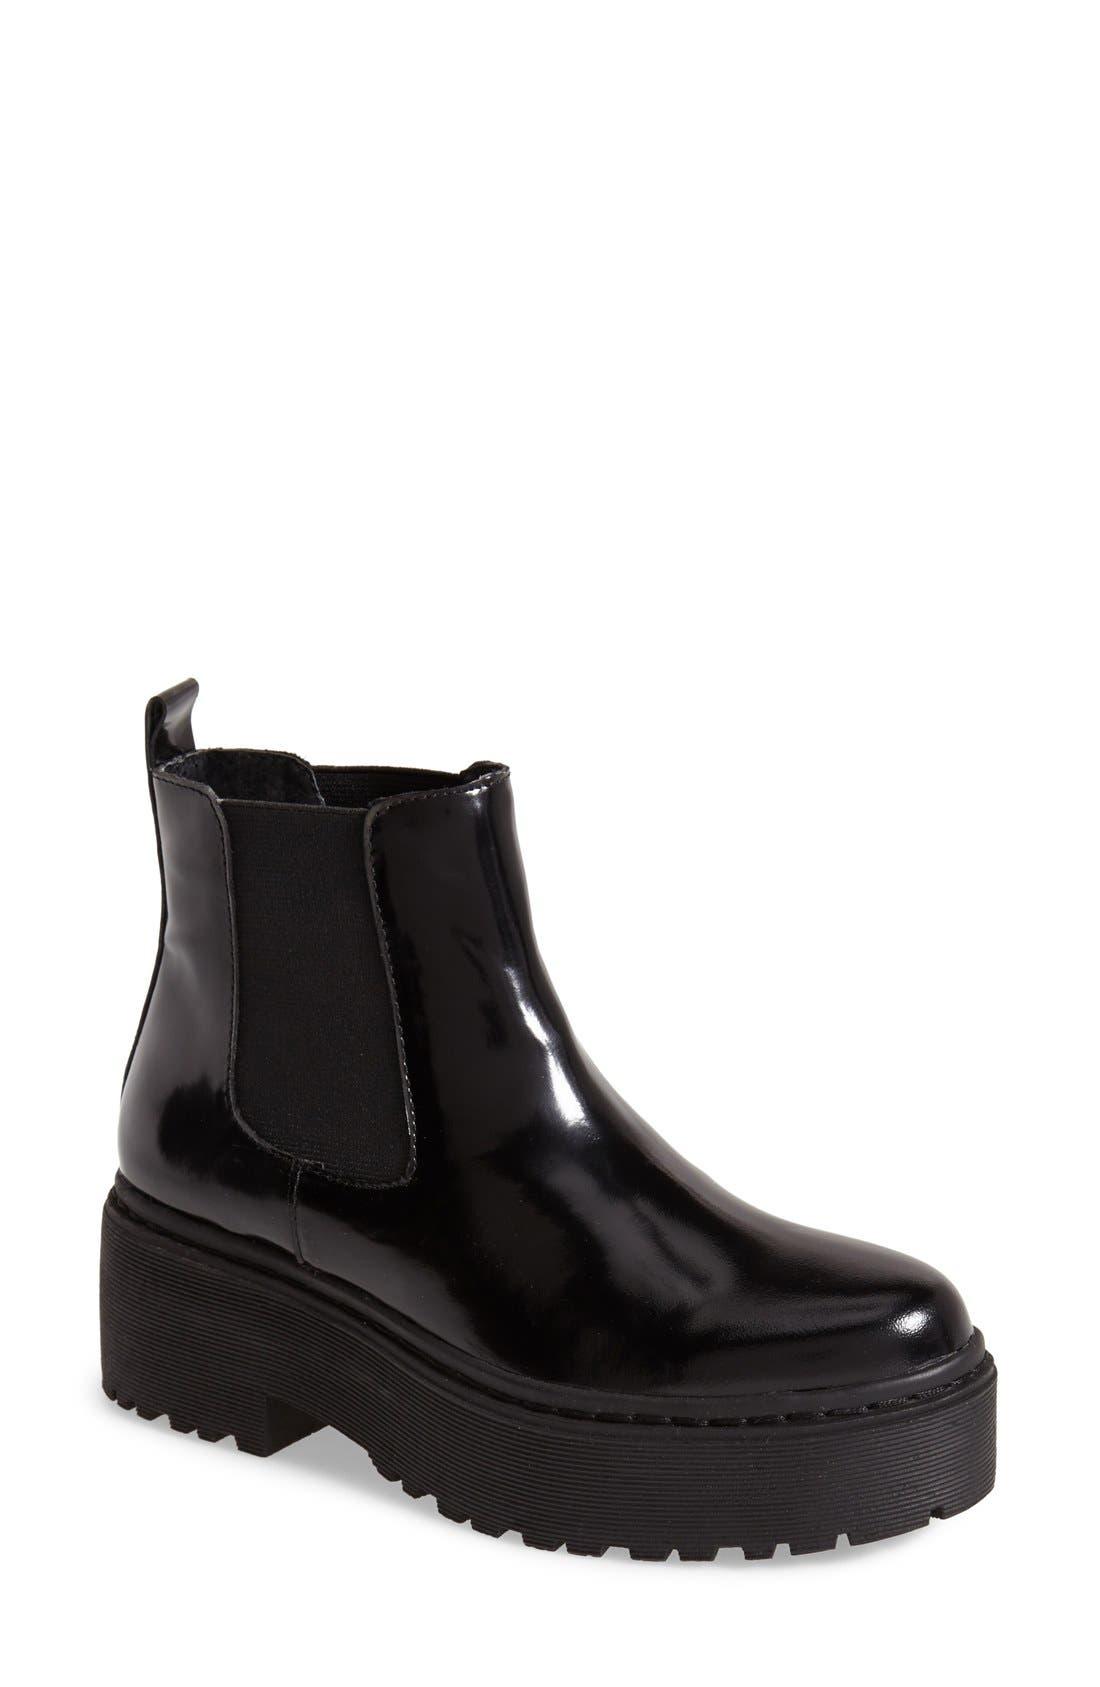 Main Image - Jeffrey Campbell 'Universal' Chelsea Boot (Women)